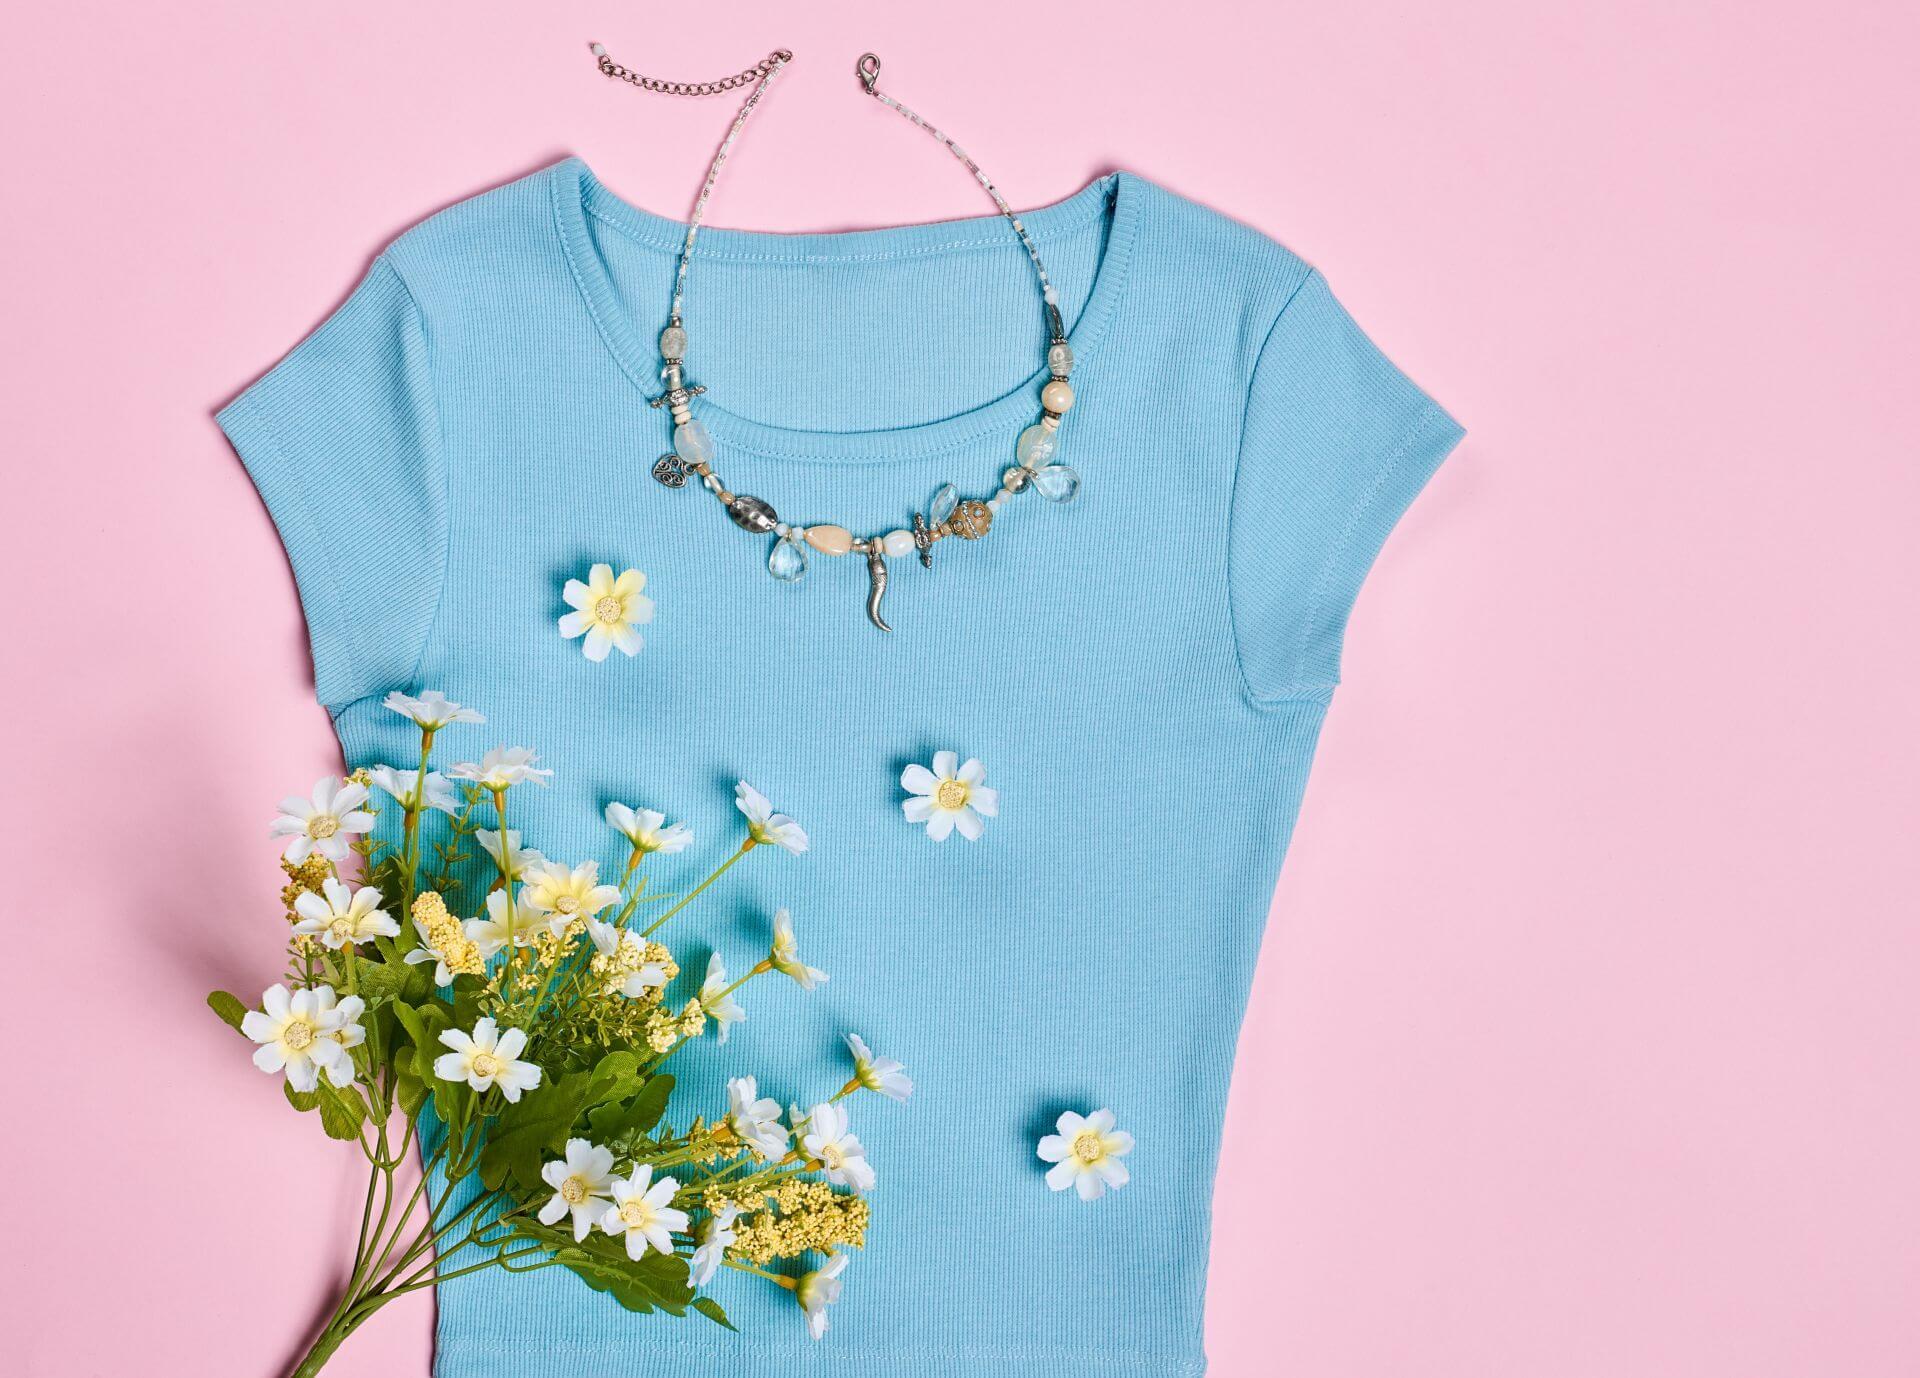 Moda wiosna 2021 trendy